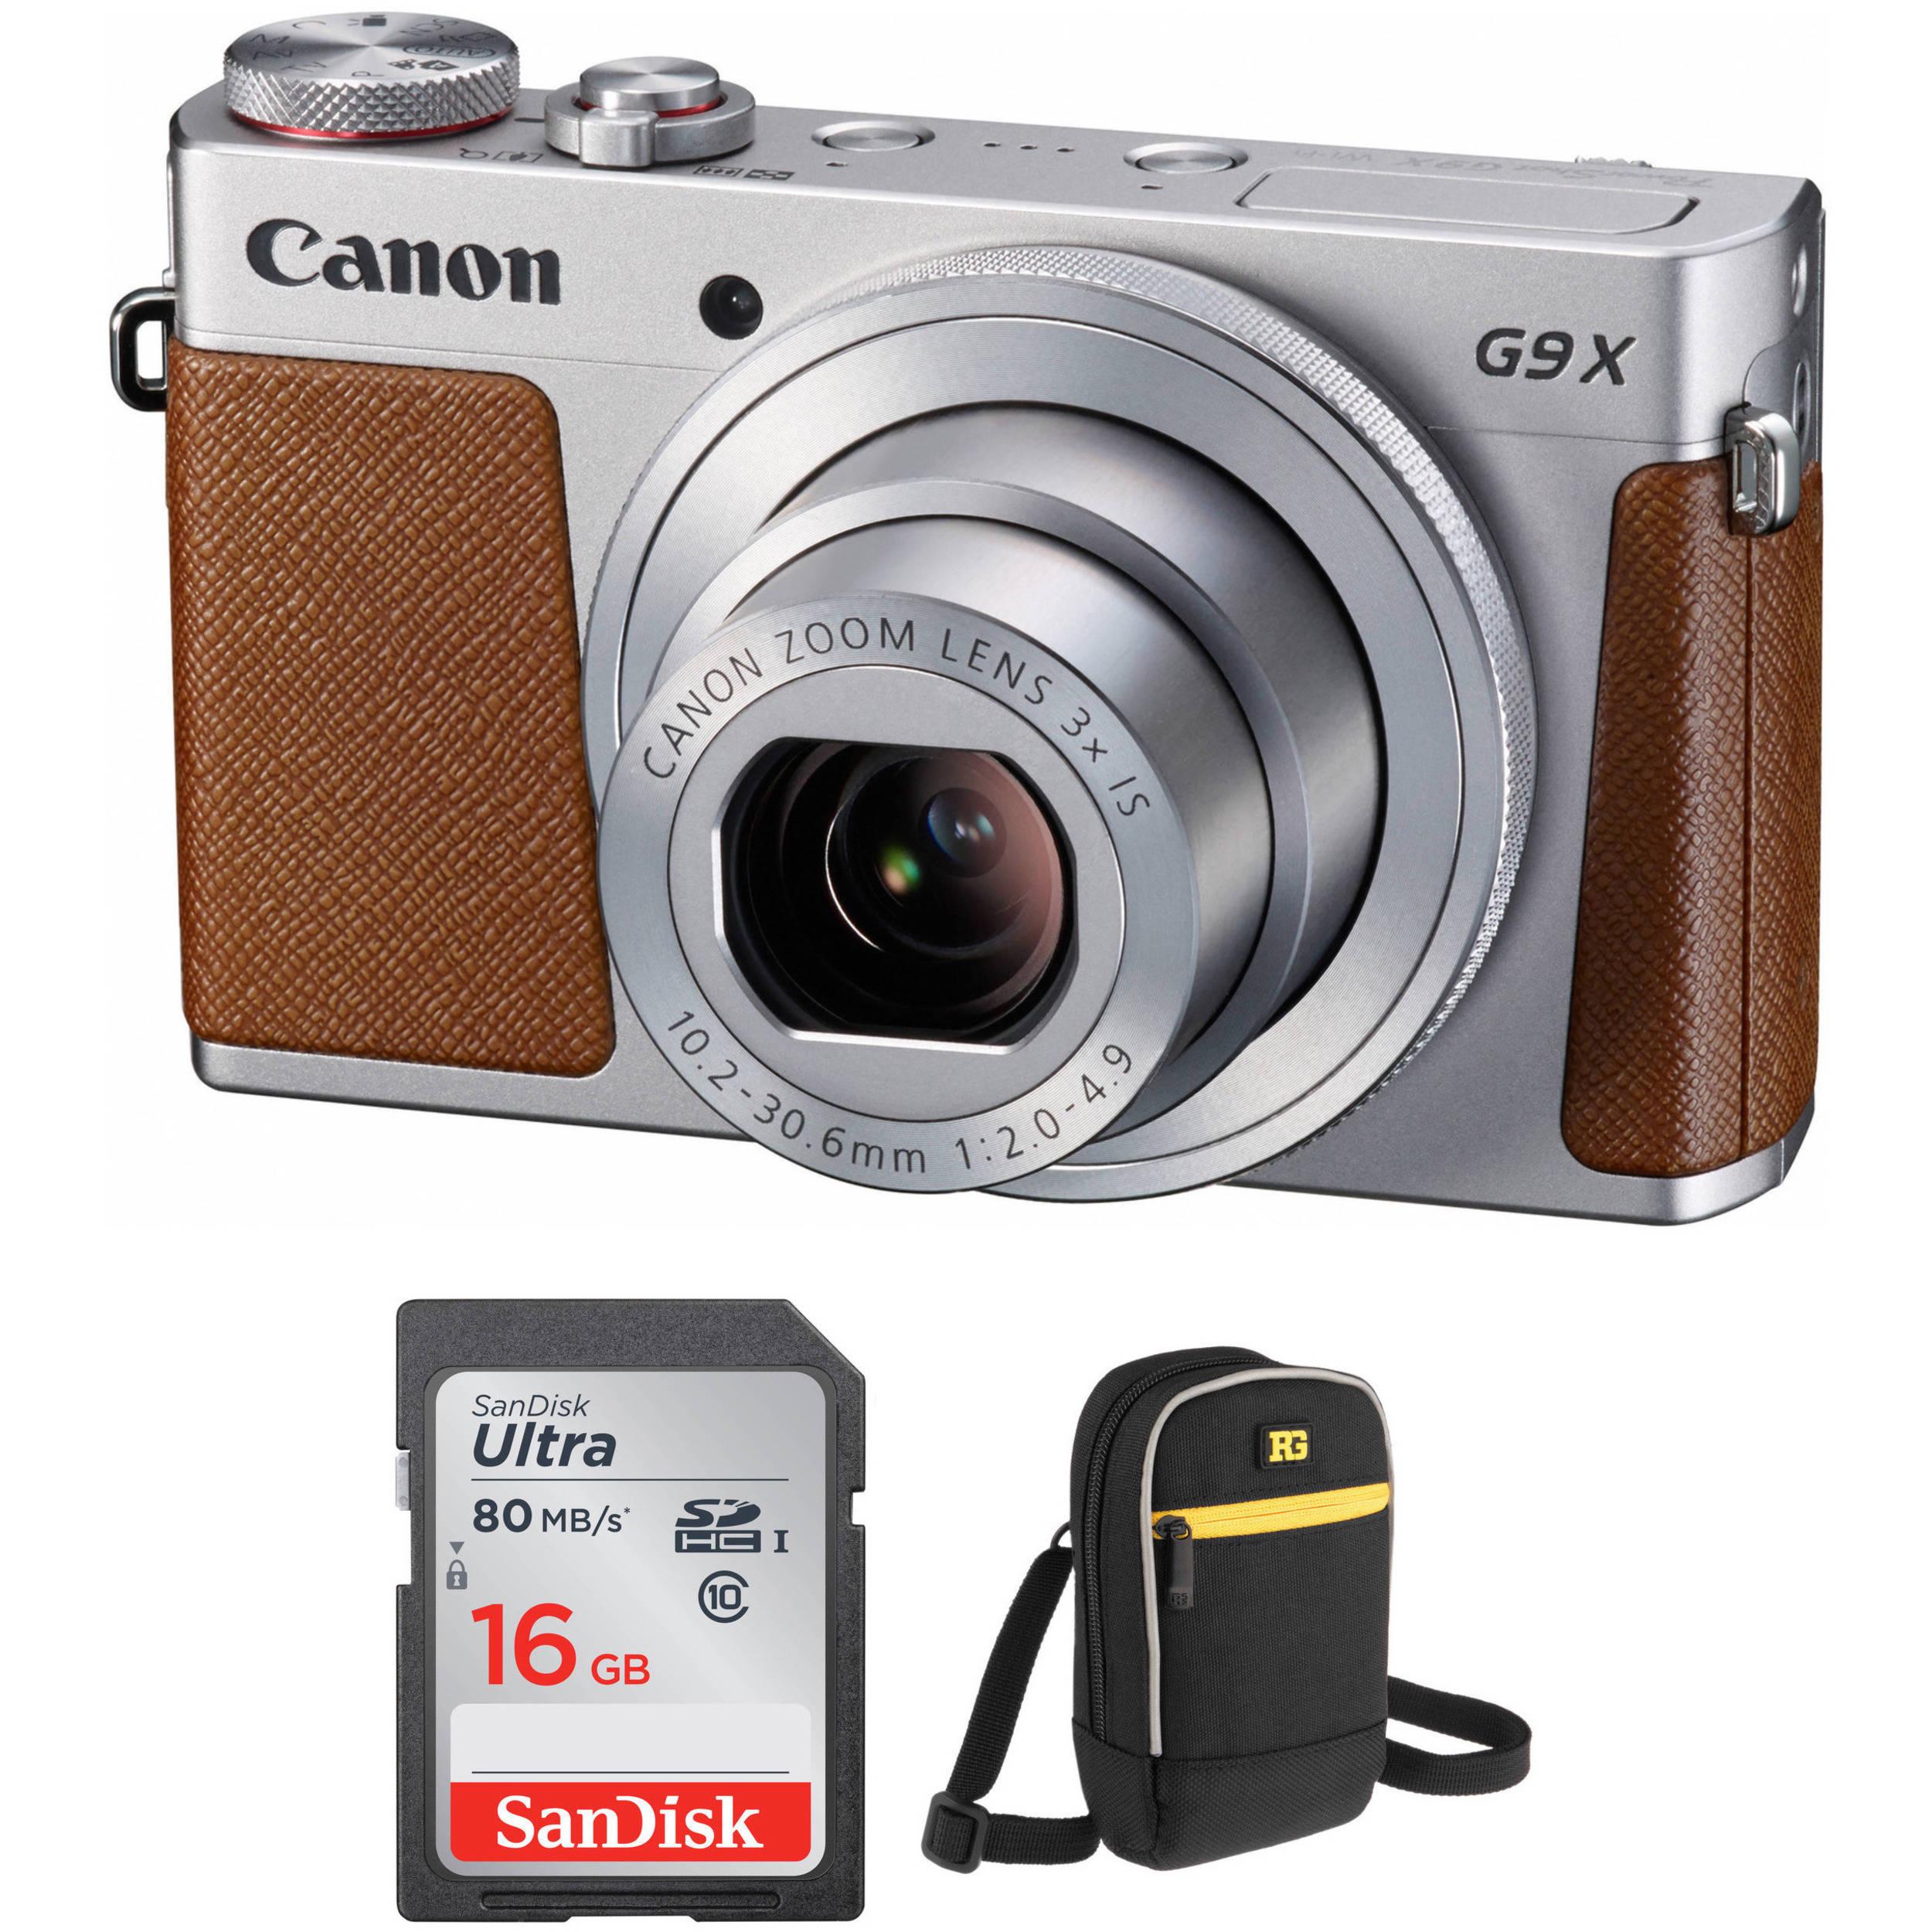 canon powershot g9 x digital camera accessory kit silver b h rh bhphotovideo com canon powershot g9 x user manual canon powershot g9 user manual